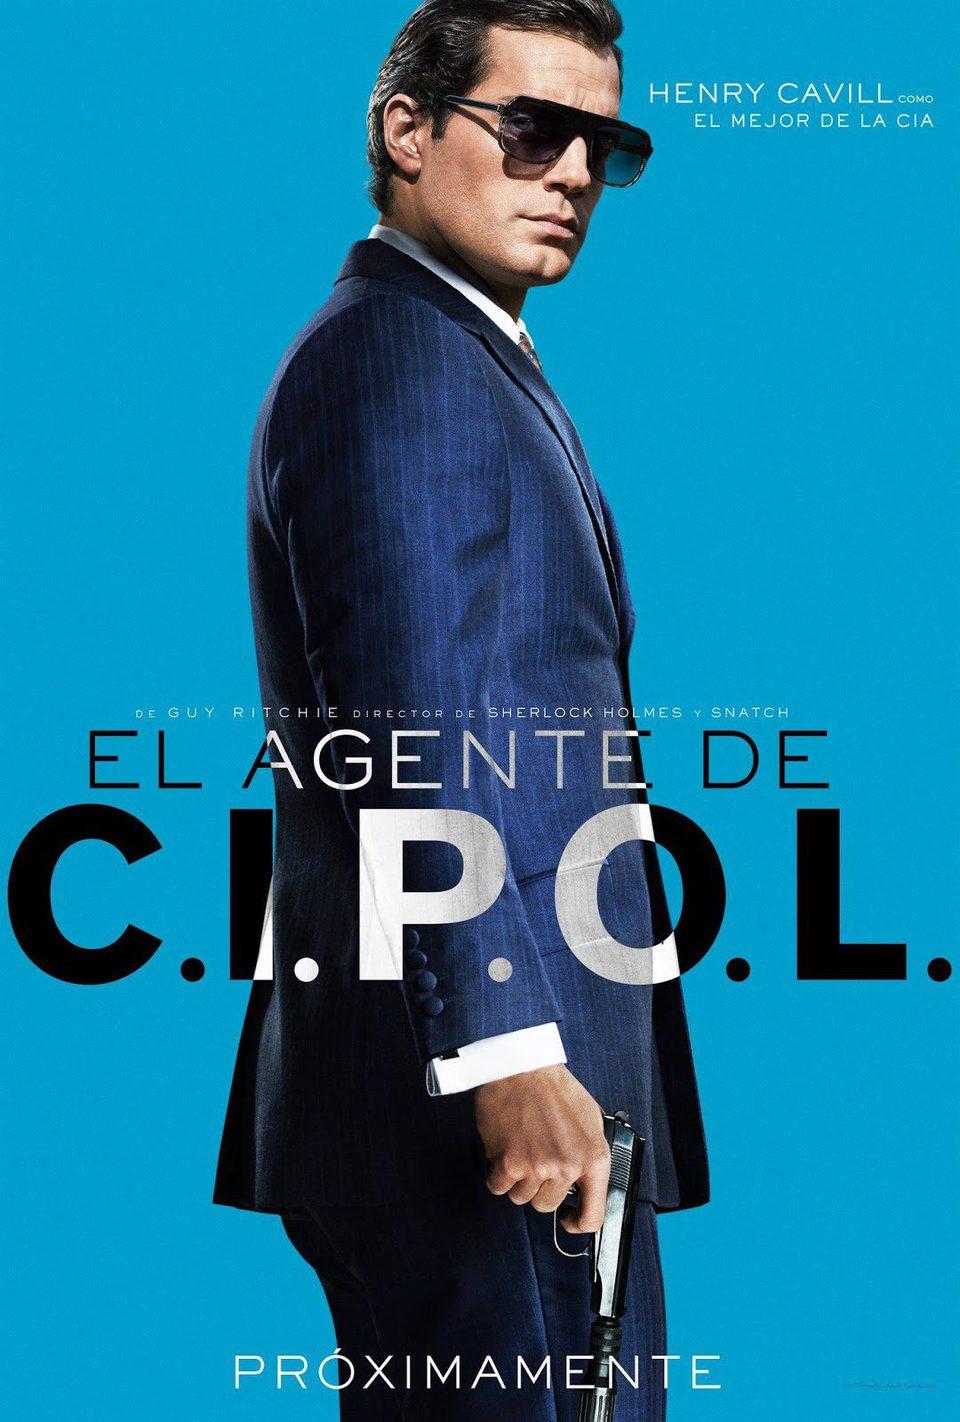 Cartel México de 'Operación U.N.C.L.E.'